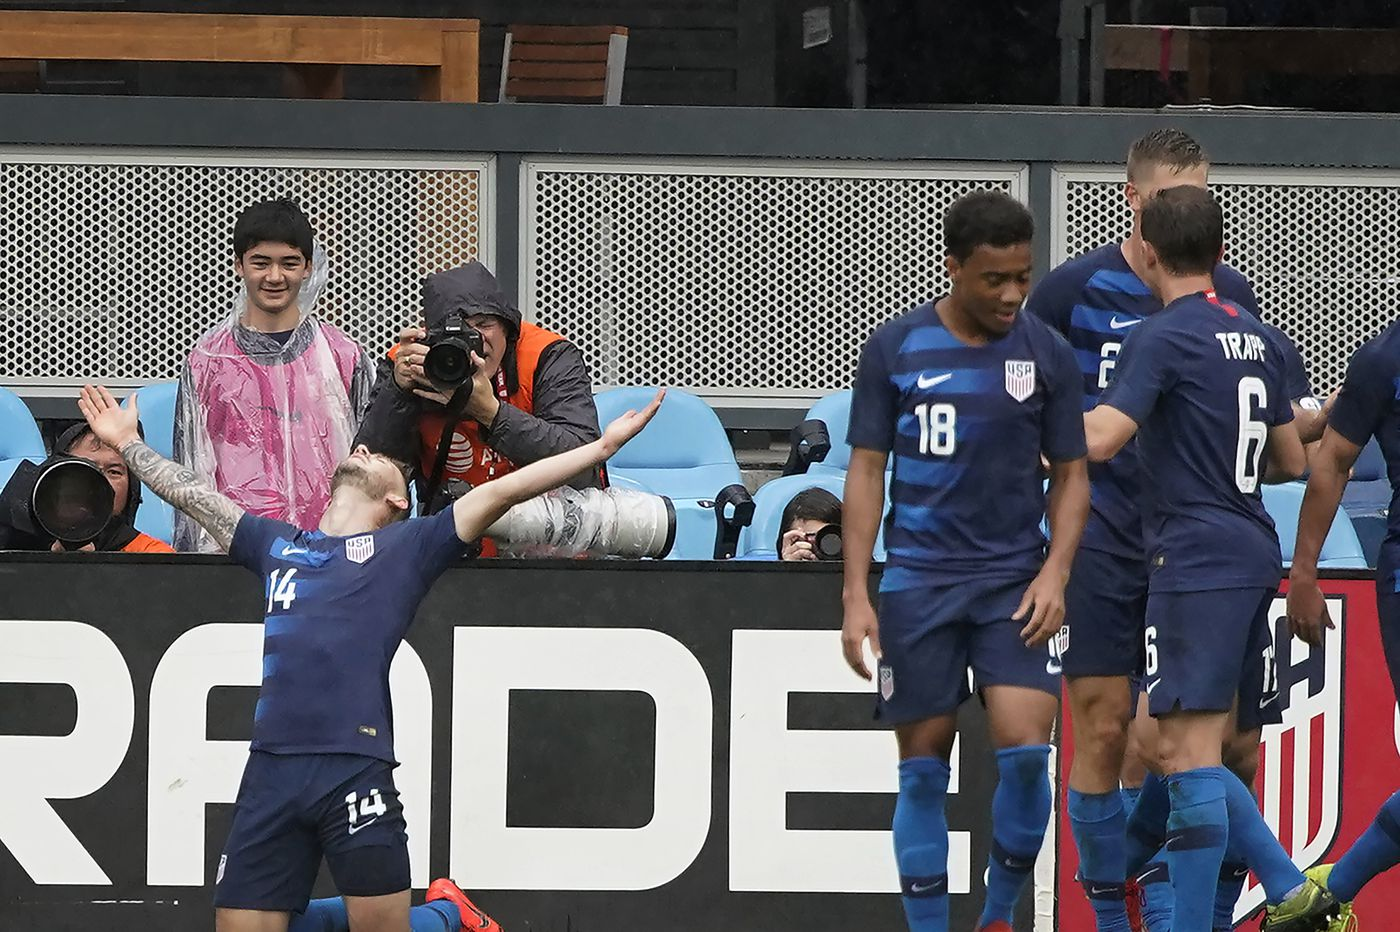 U.S. men's soccer team beats Costa Rica 2-0 for Gregg Berhalter's second straight win as coach